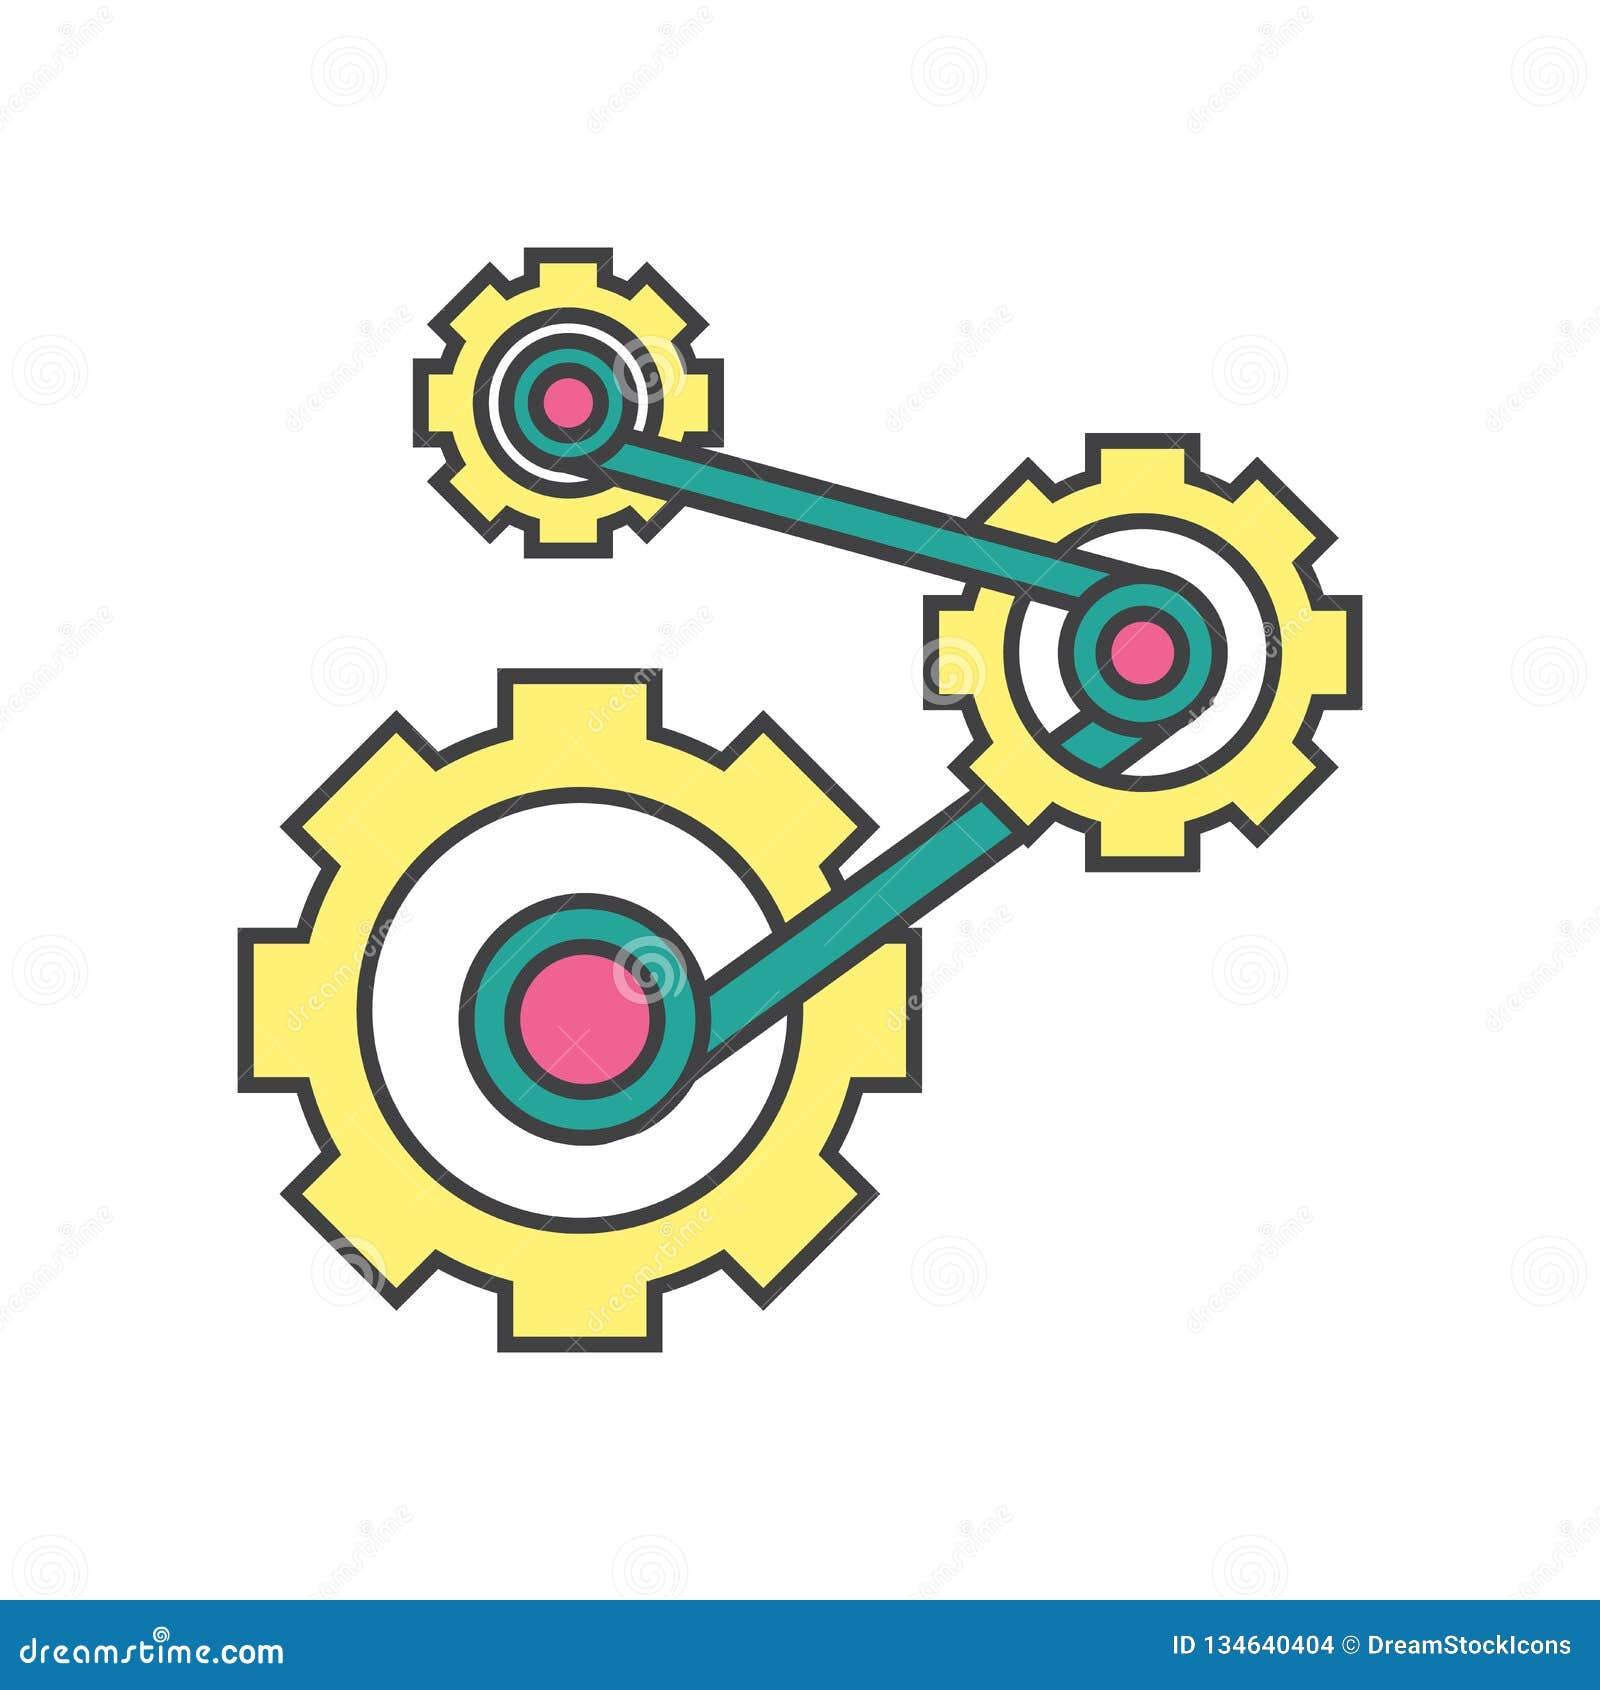 Mechanics icon vector sign and symbol isolated on white background, Mechanics logo concept